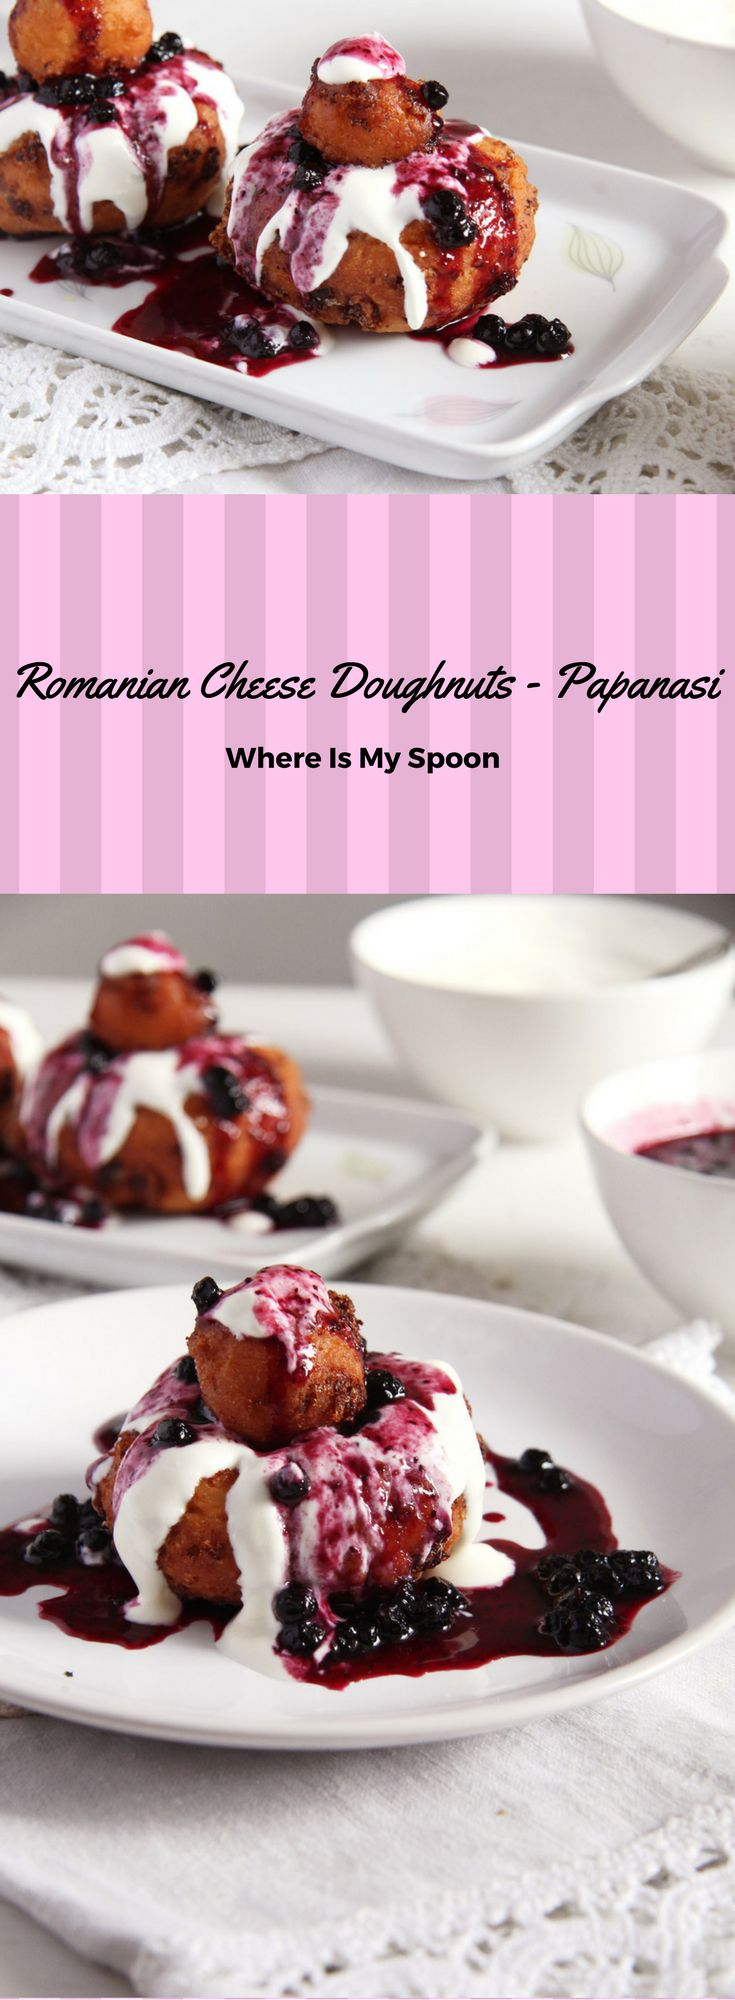 Romanian Cheese Doughnuts – Papanasi